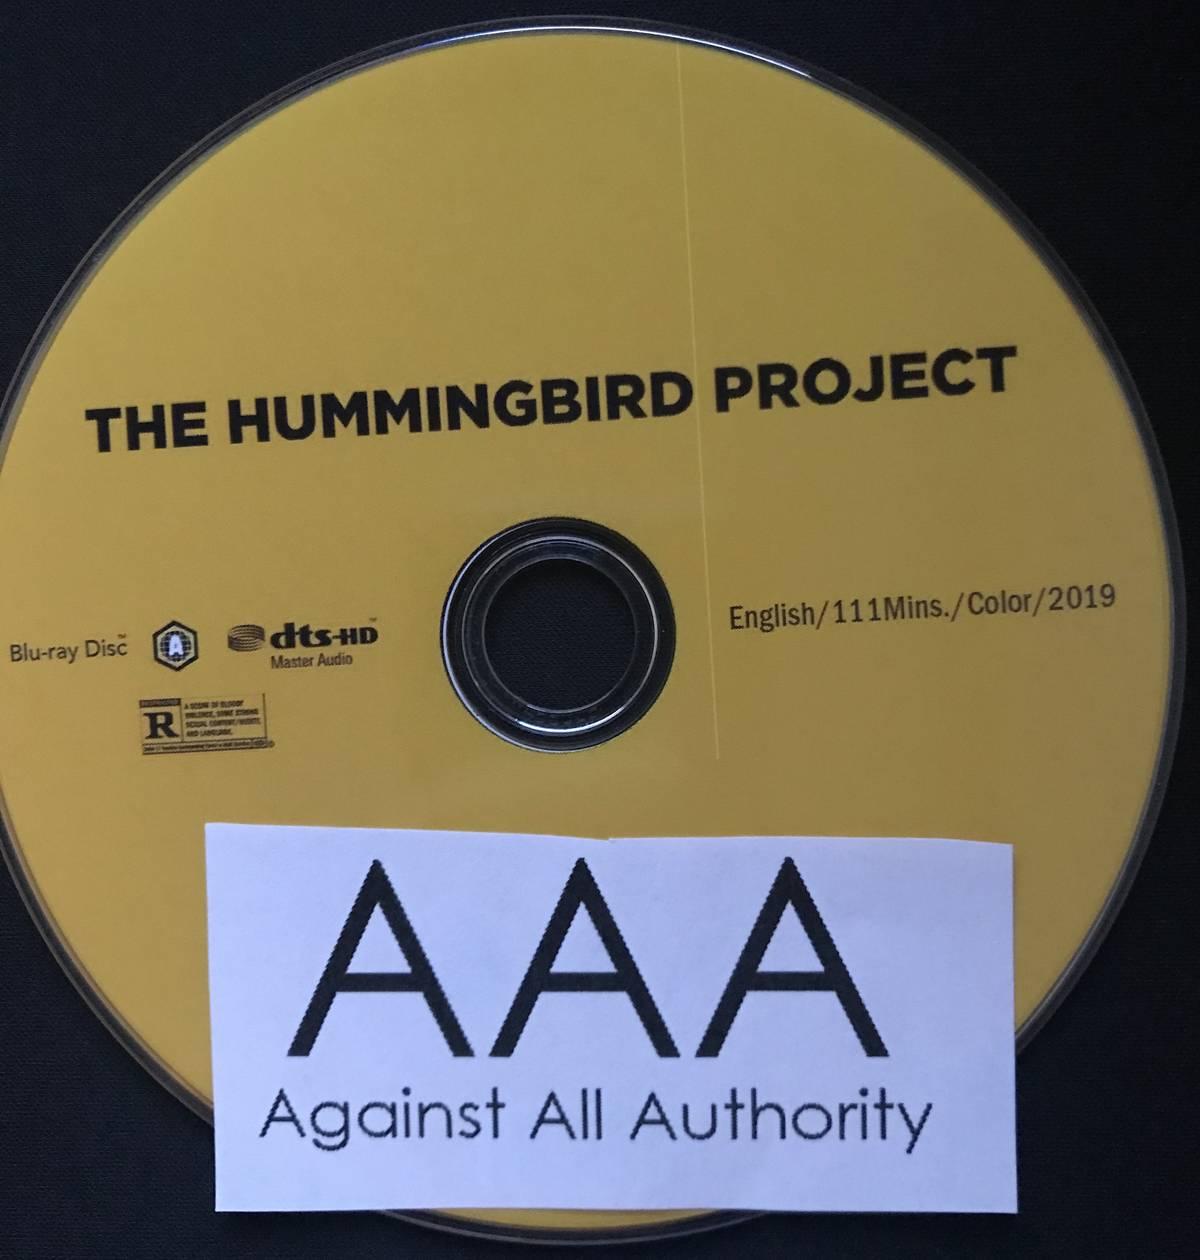 The Hummingbird Project 2018 iNTERNAL BDRip x264-AAA